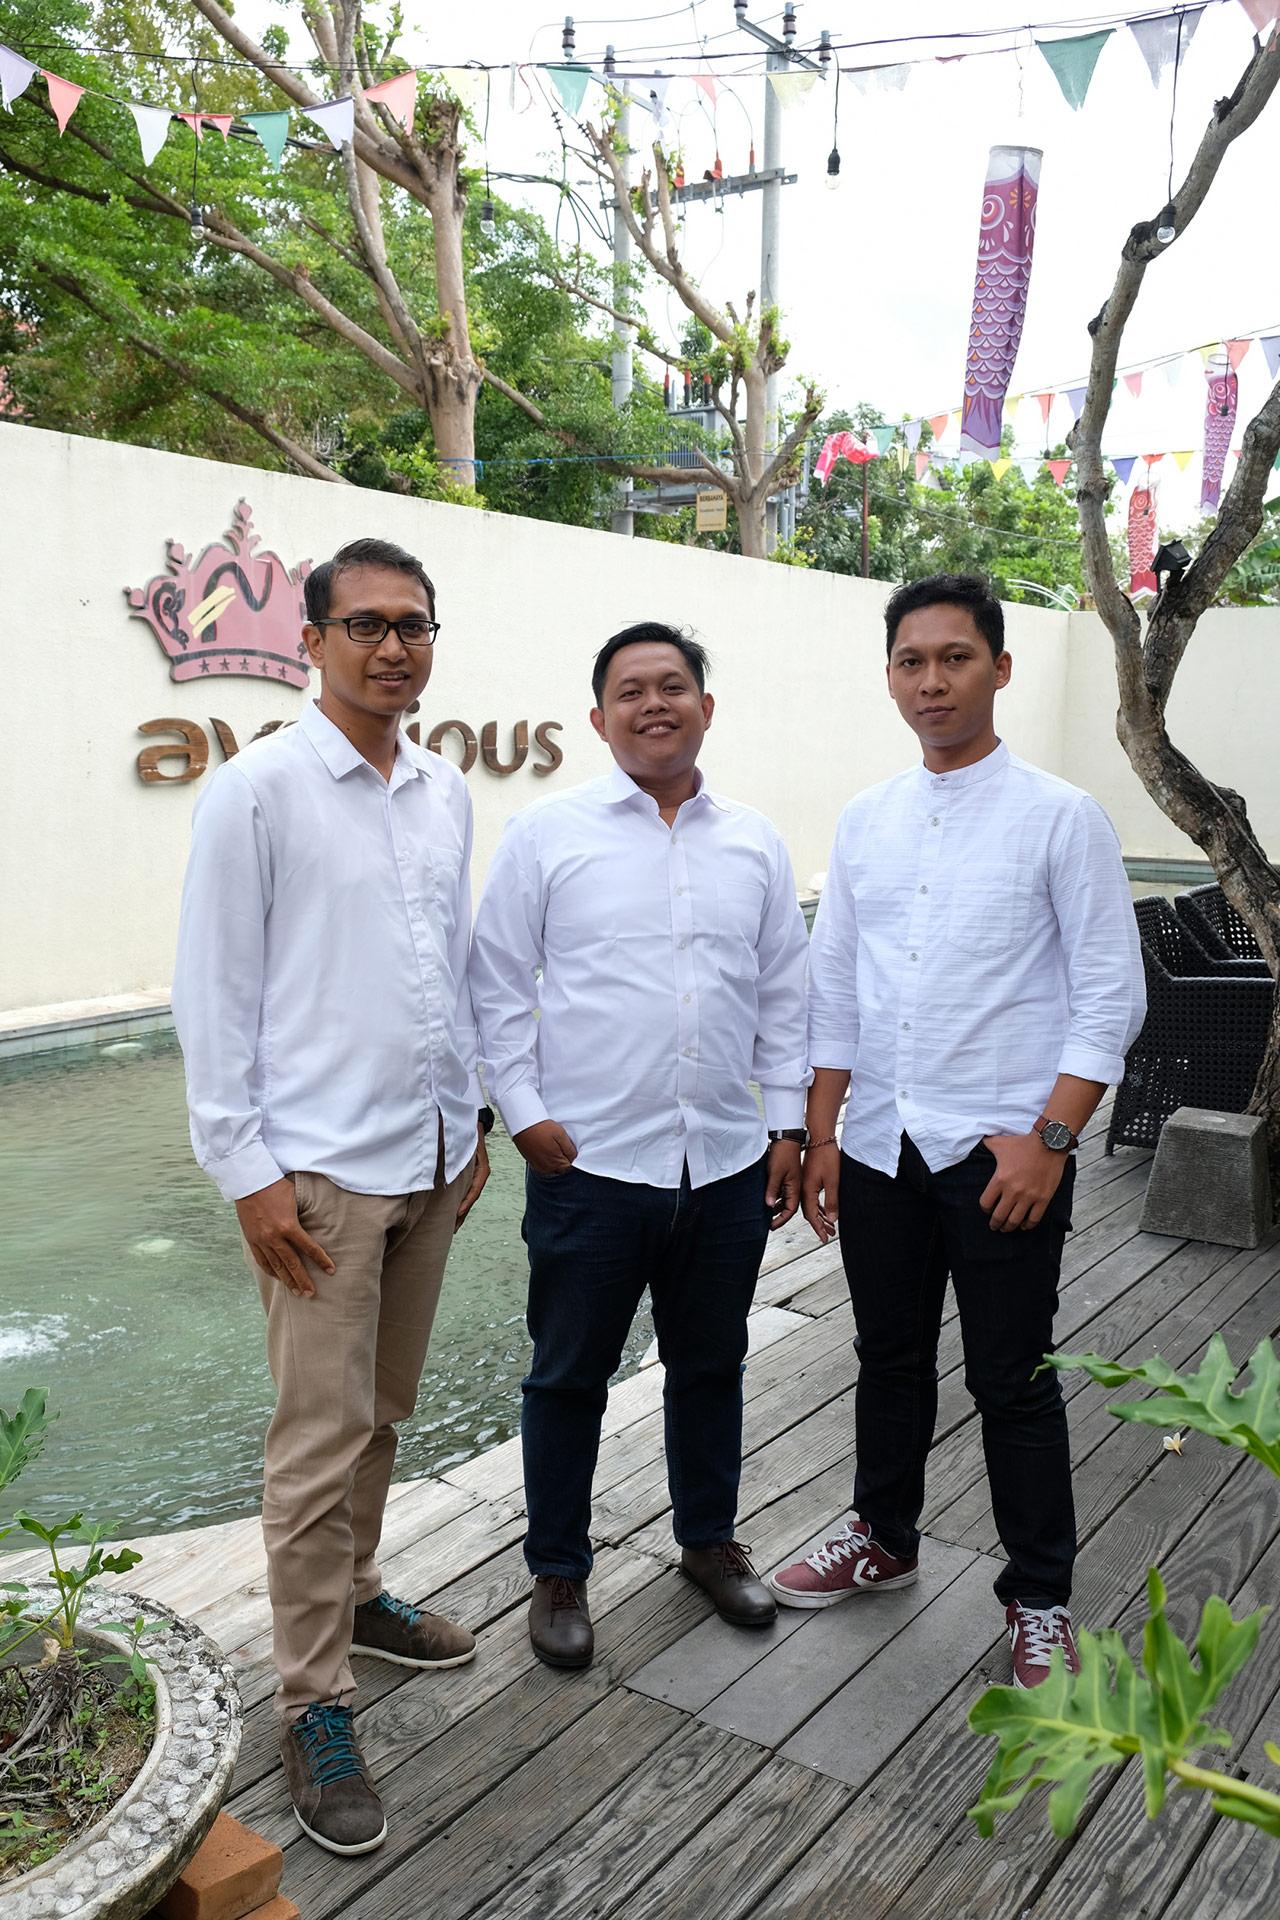 Bali Emporio Architect Team Performs Photo Together at Ayucious, Denpasar 11